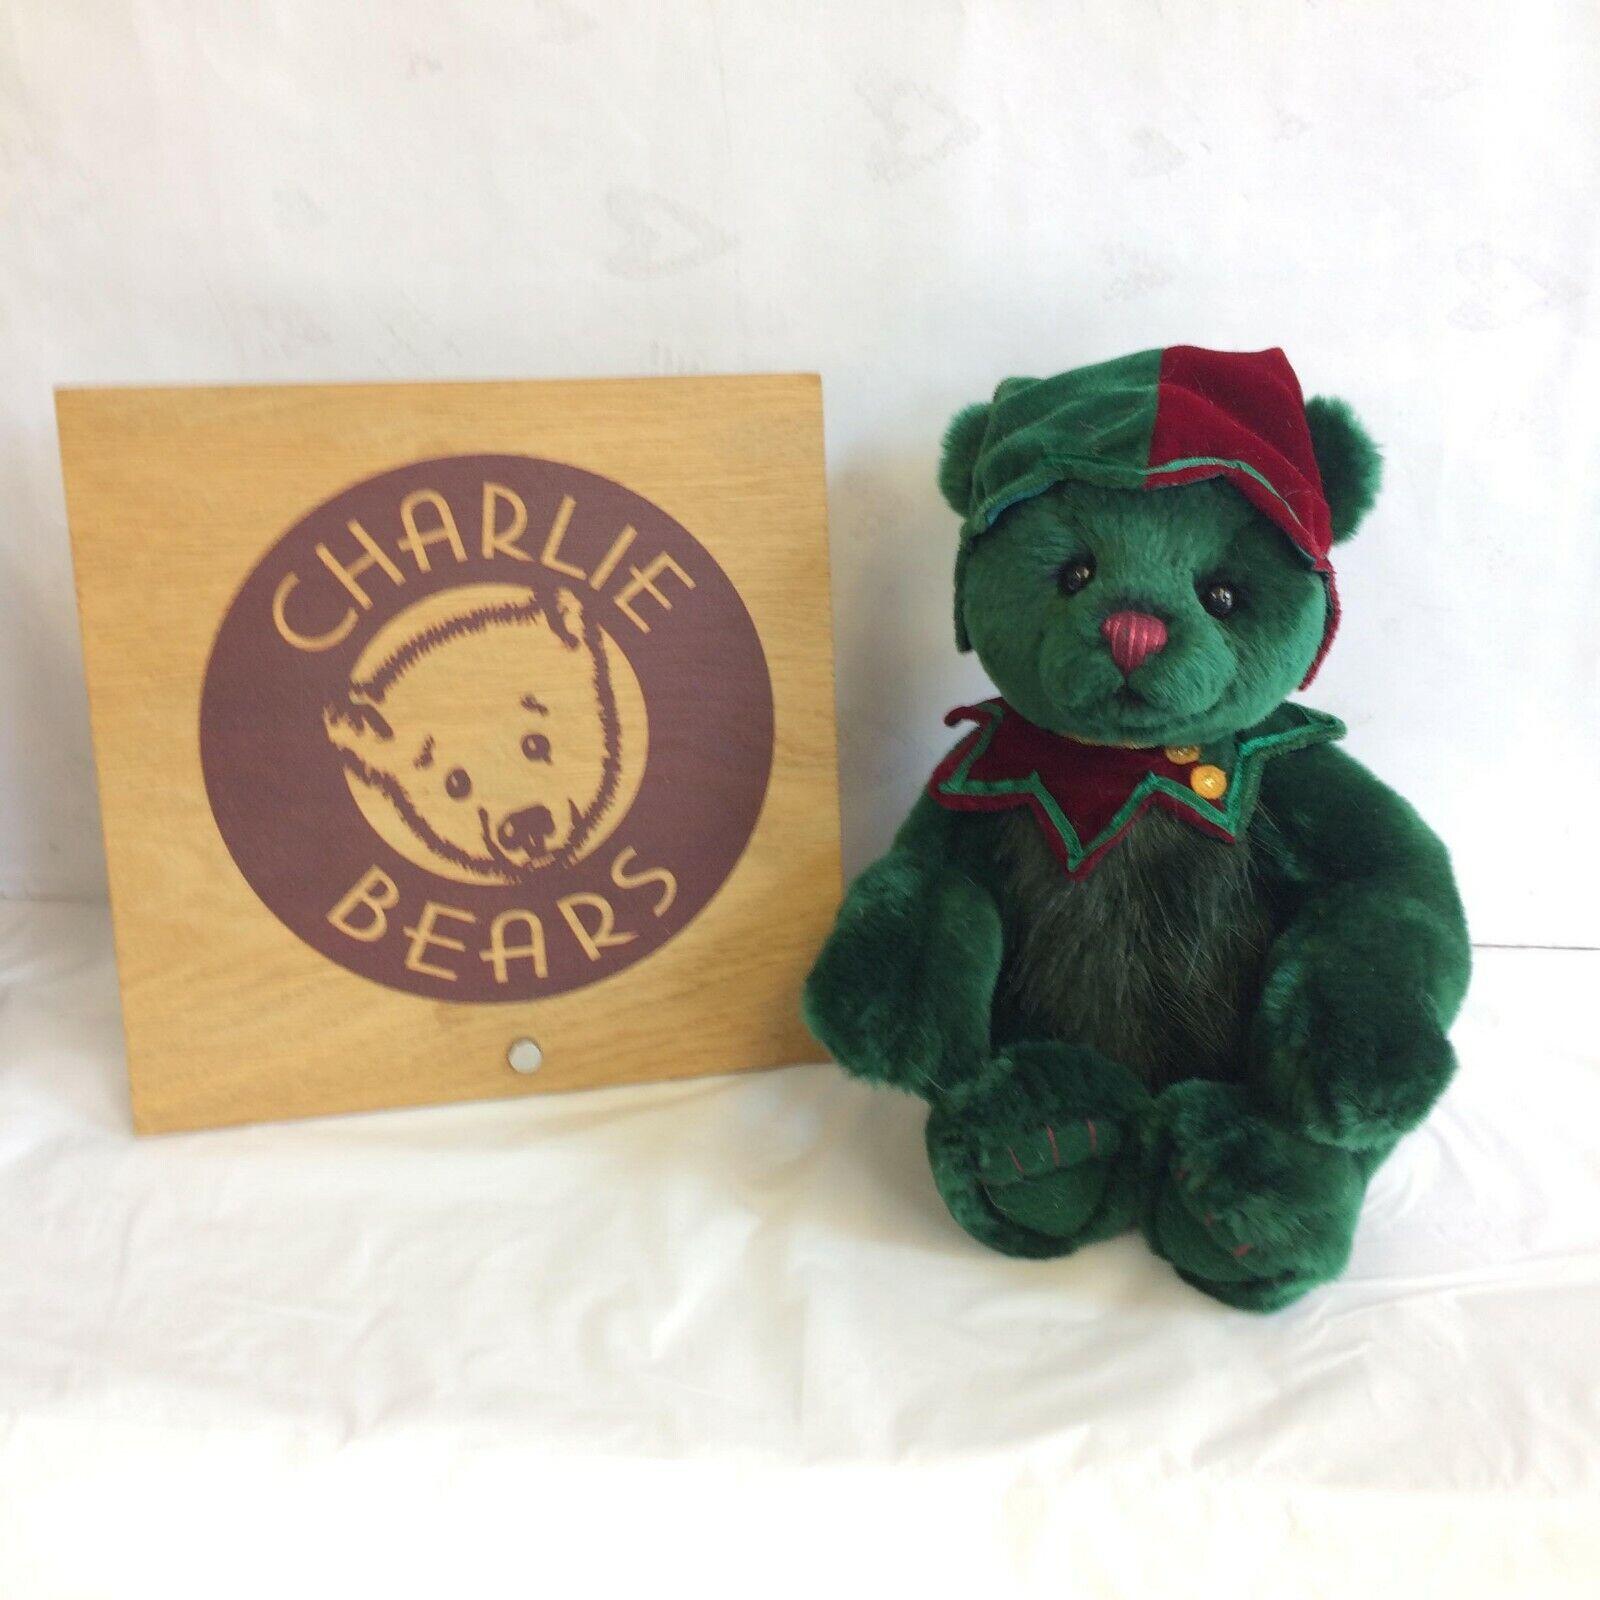 Charlie Bears Purrkins Plush Bear - BNWT - OFFICIAL STOCKIST